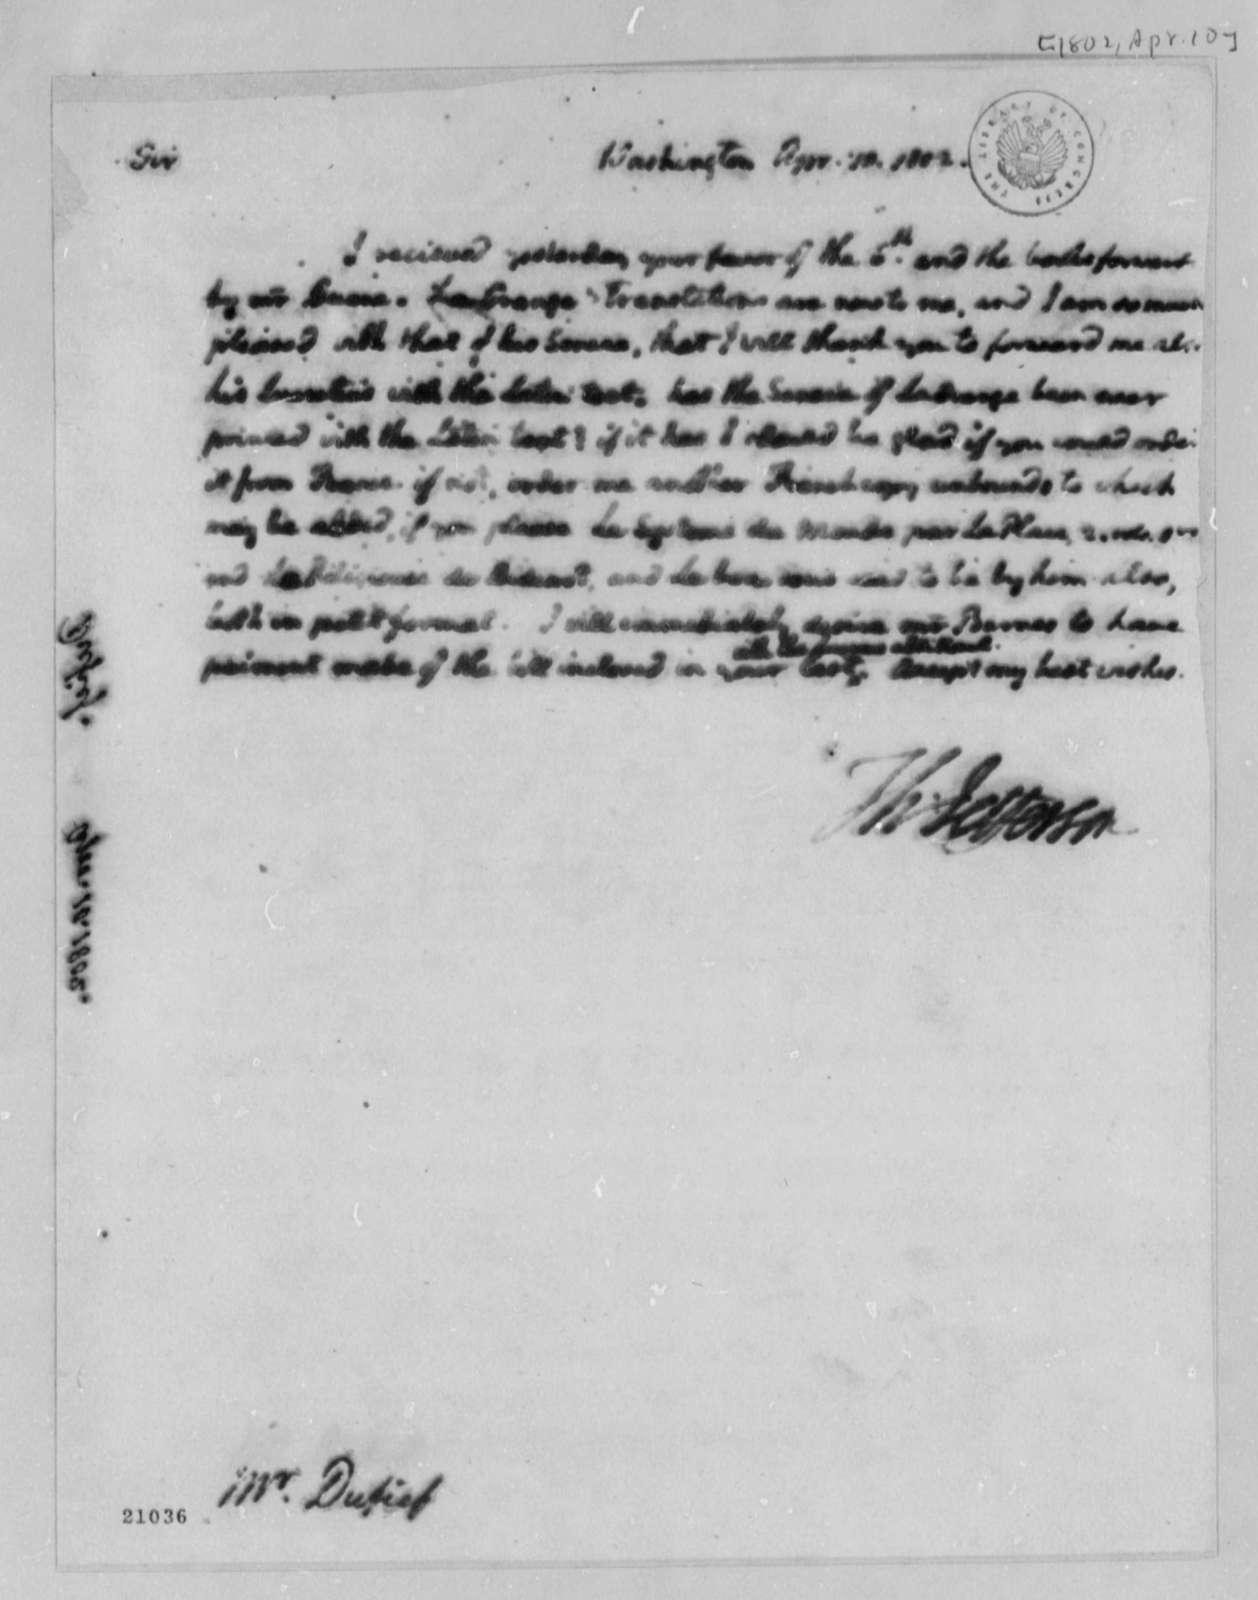 Thomas Jefferson to Nicholas Gouin Dufief, April 10, 1802